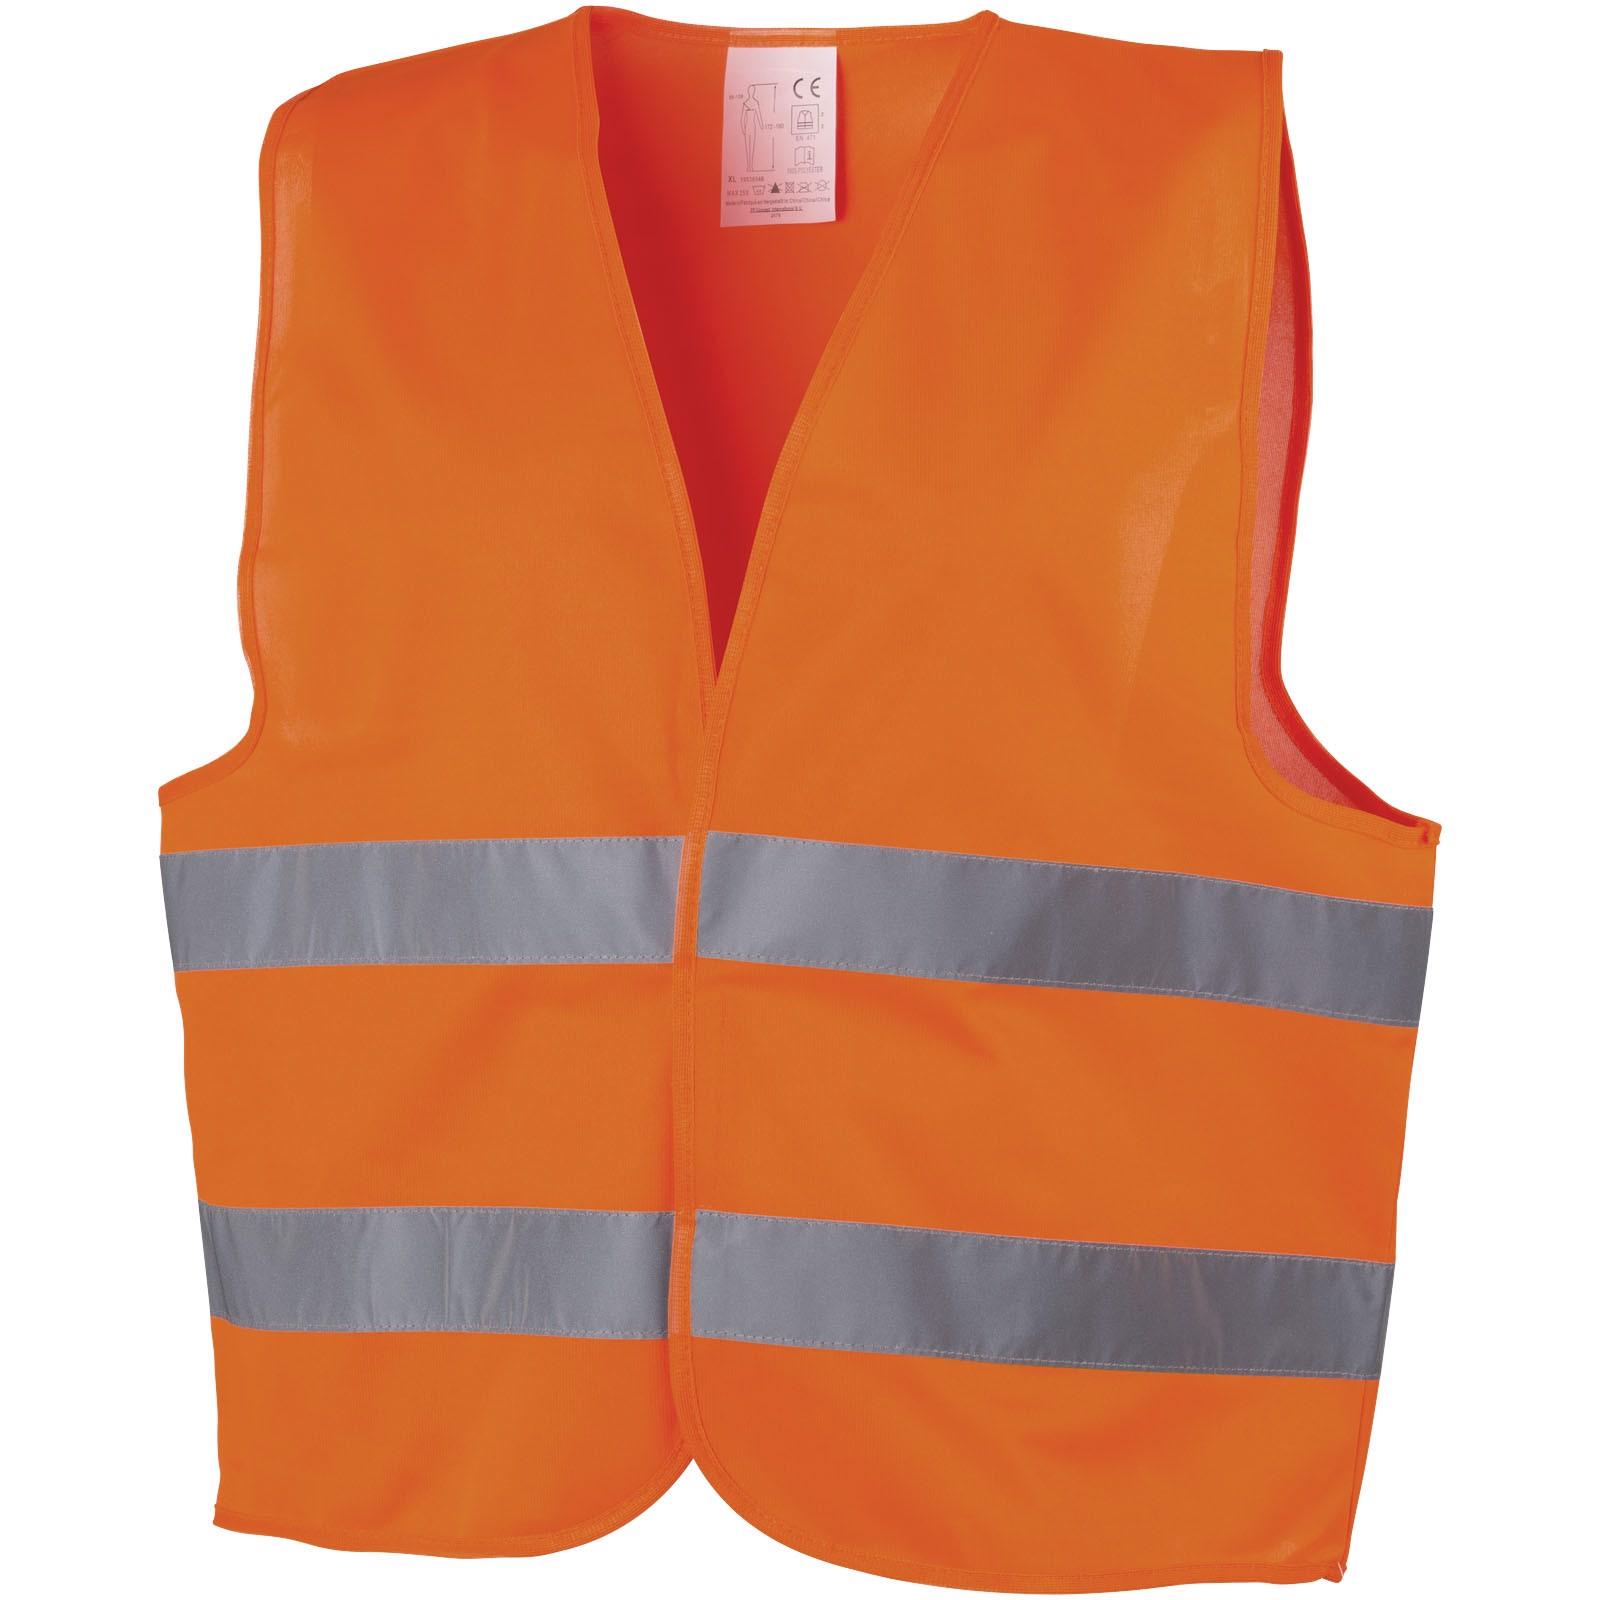 See-me XL safety vest for professional use - Orange